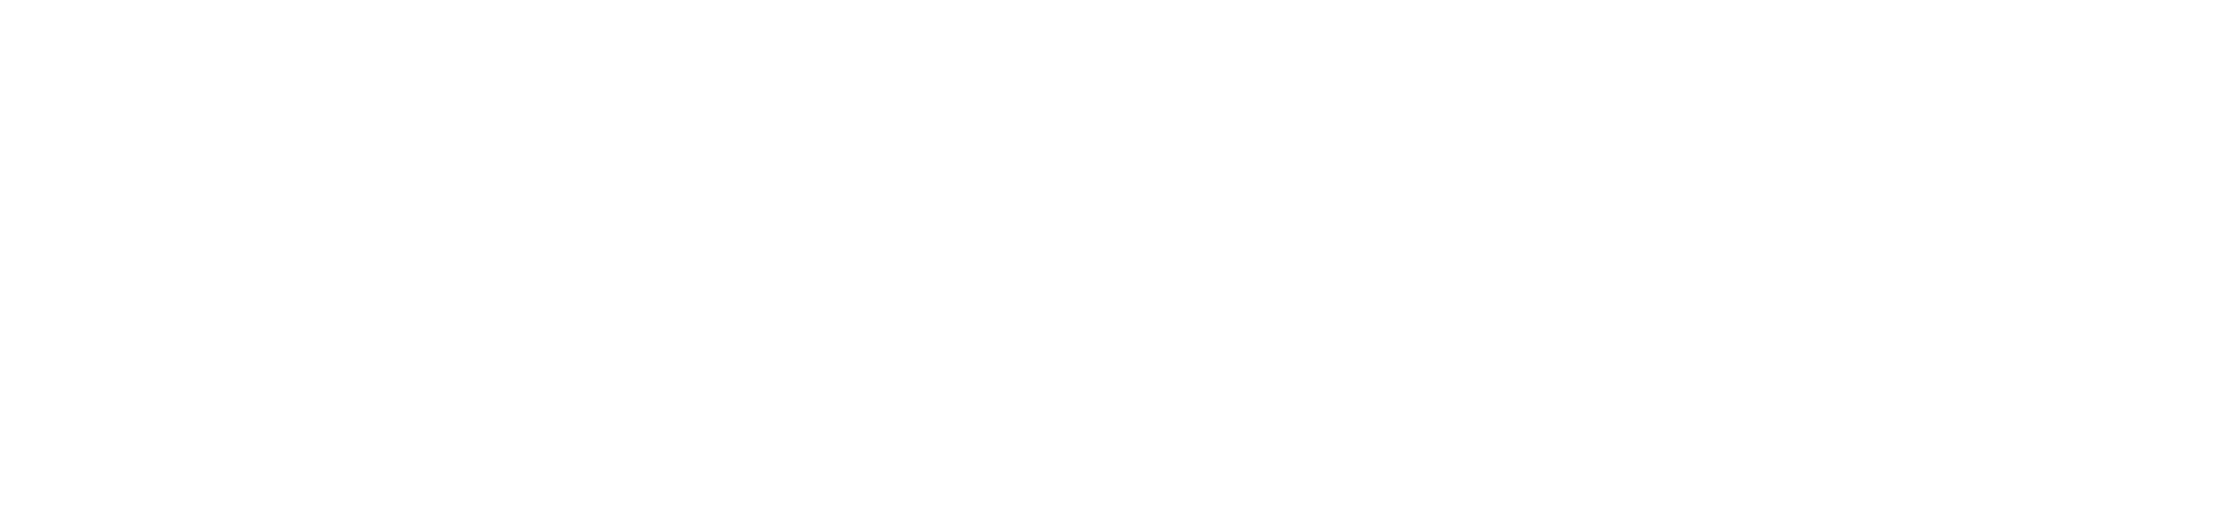 González Almacén Fotográfico Mayorista SLU